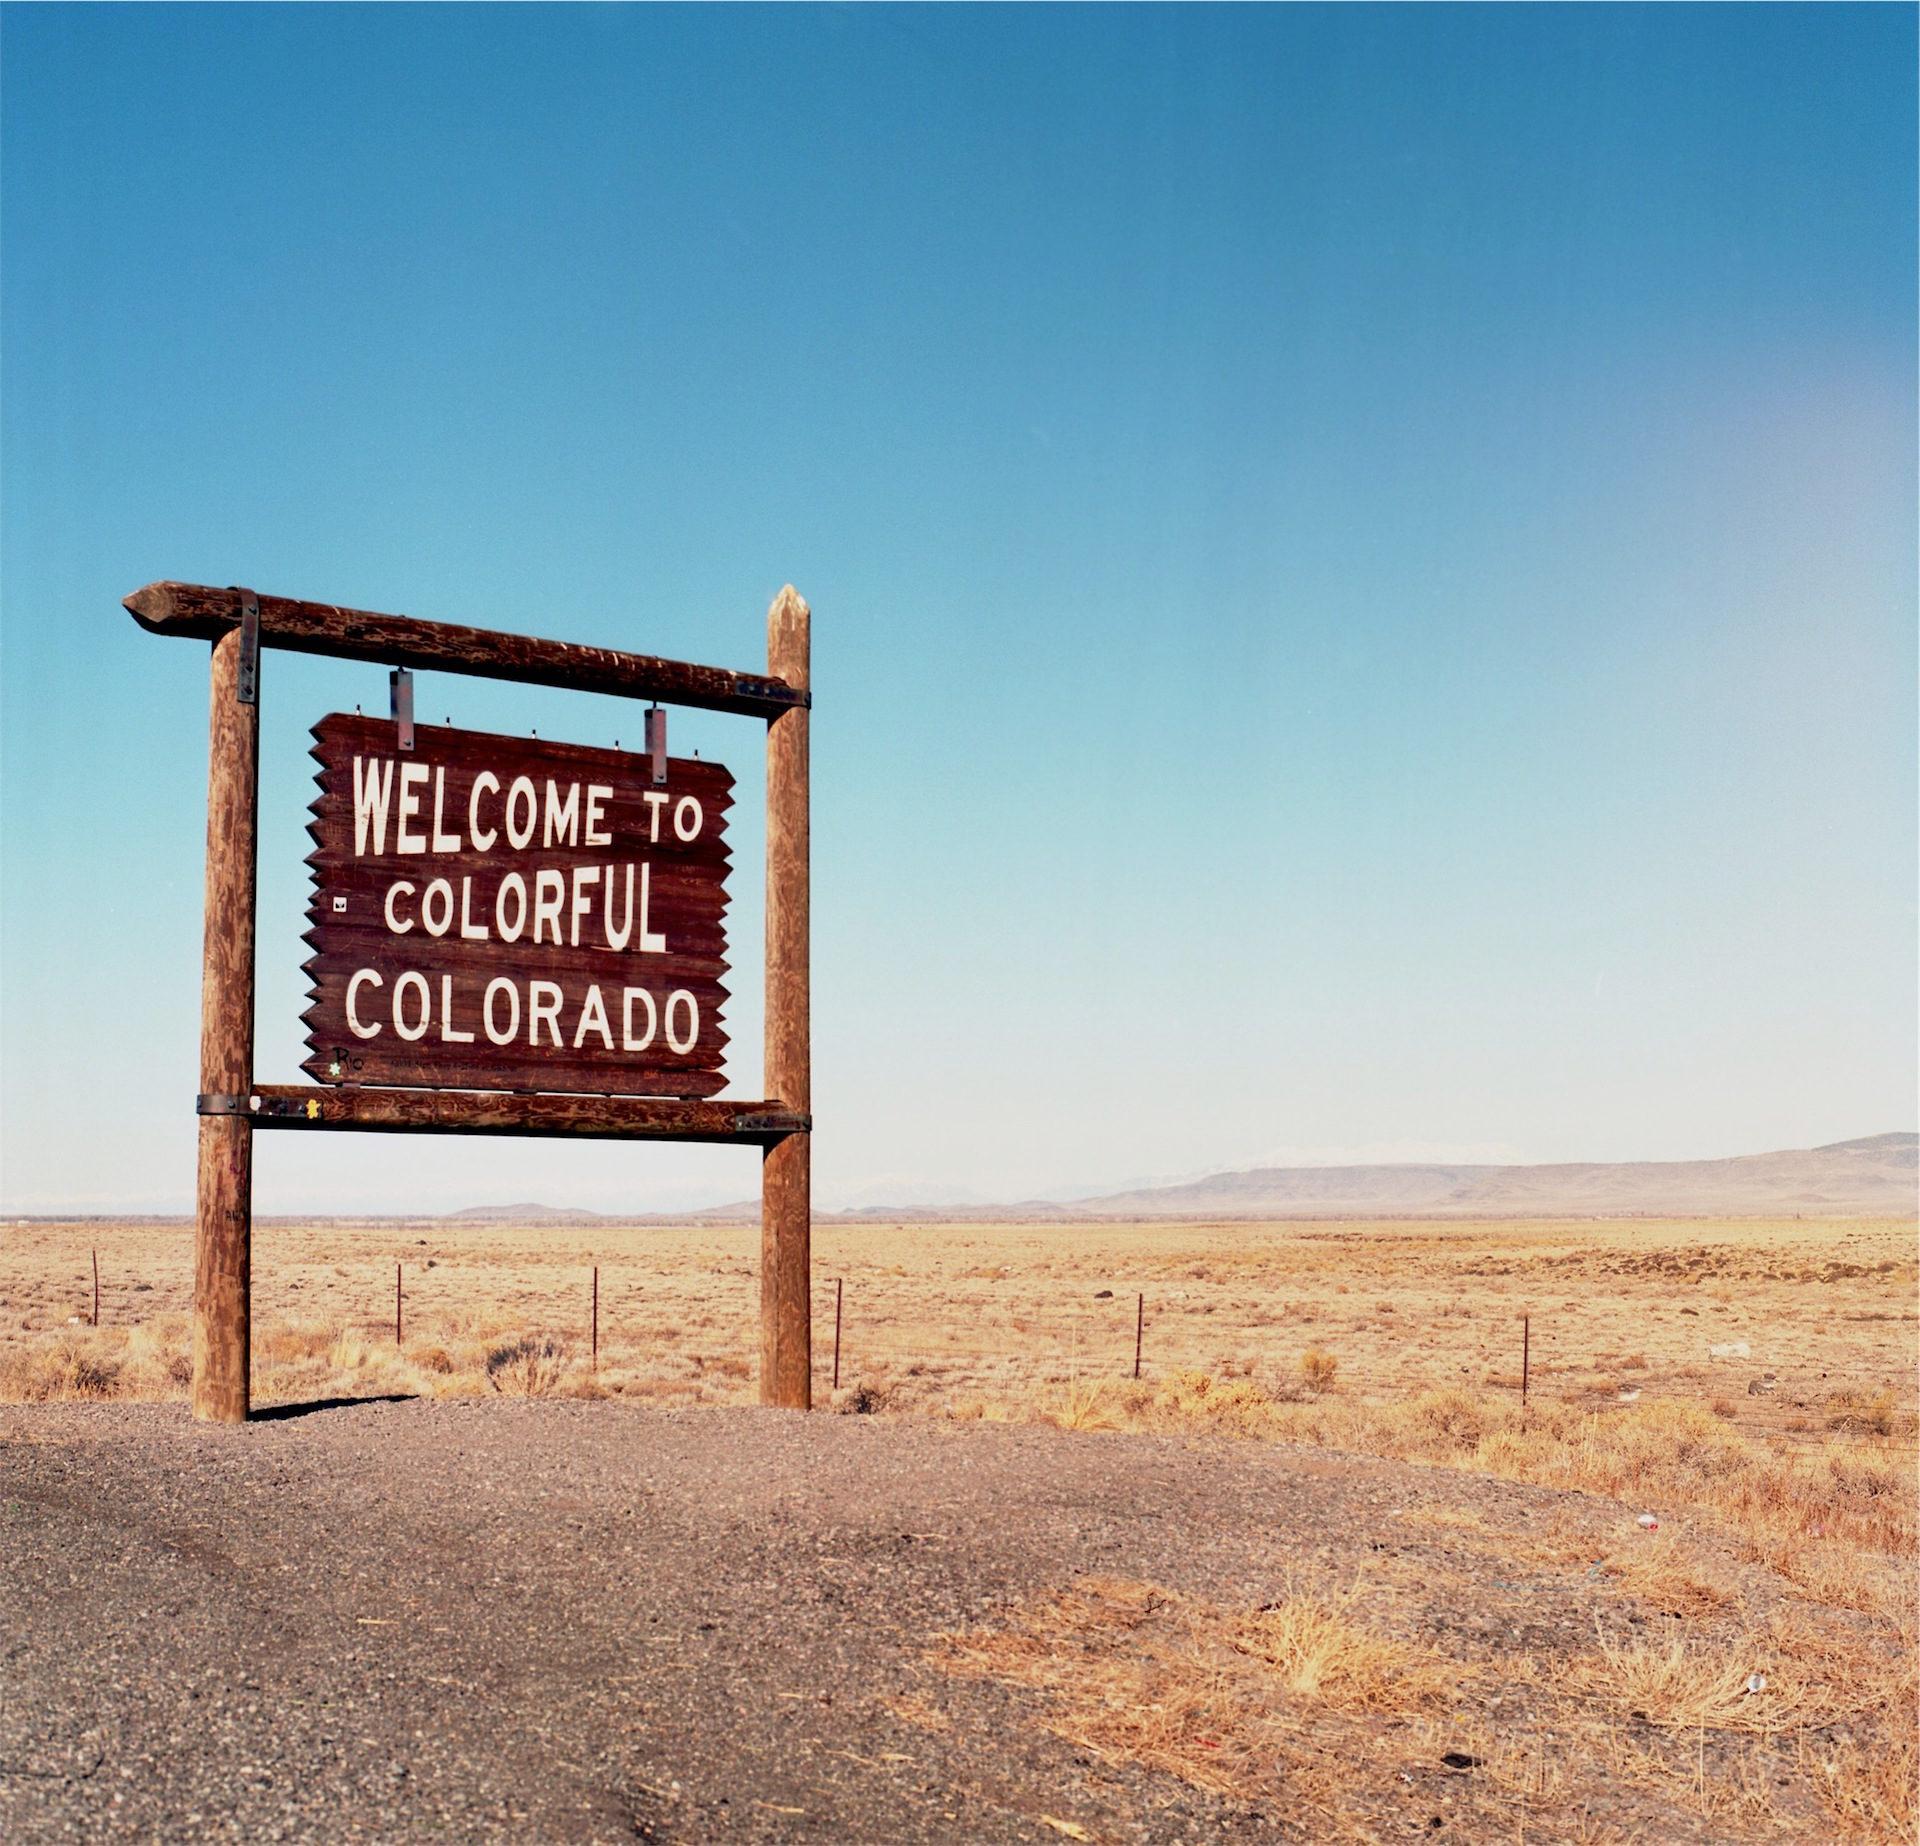 रेगिस्तान, colorado, cartel, américa, आकाश - HD वॉलपेपर - प्रोफेसर-falken.com